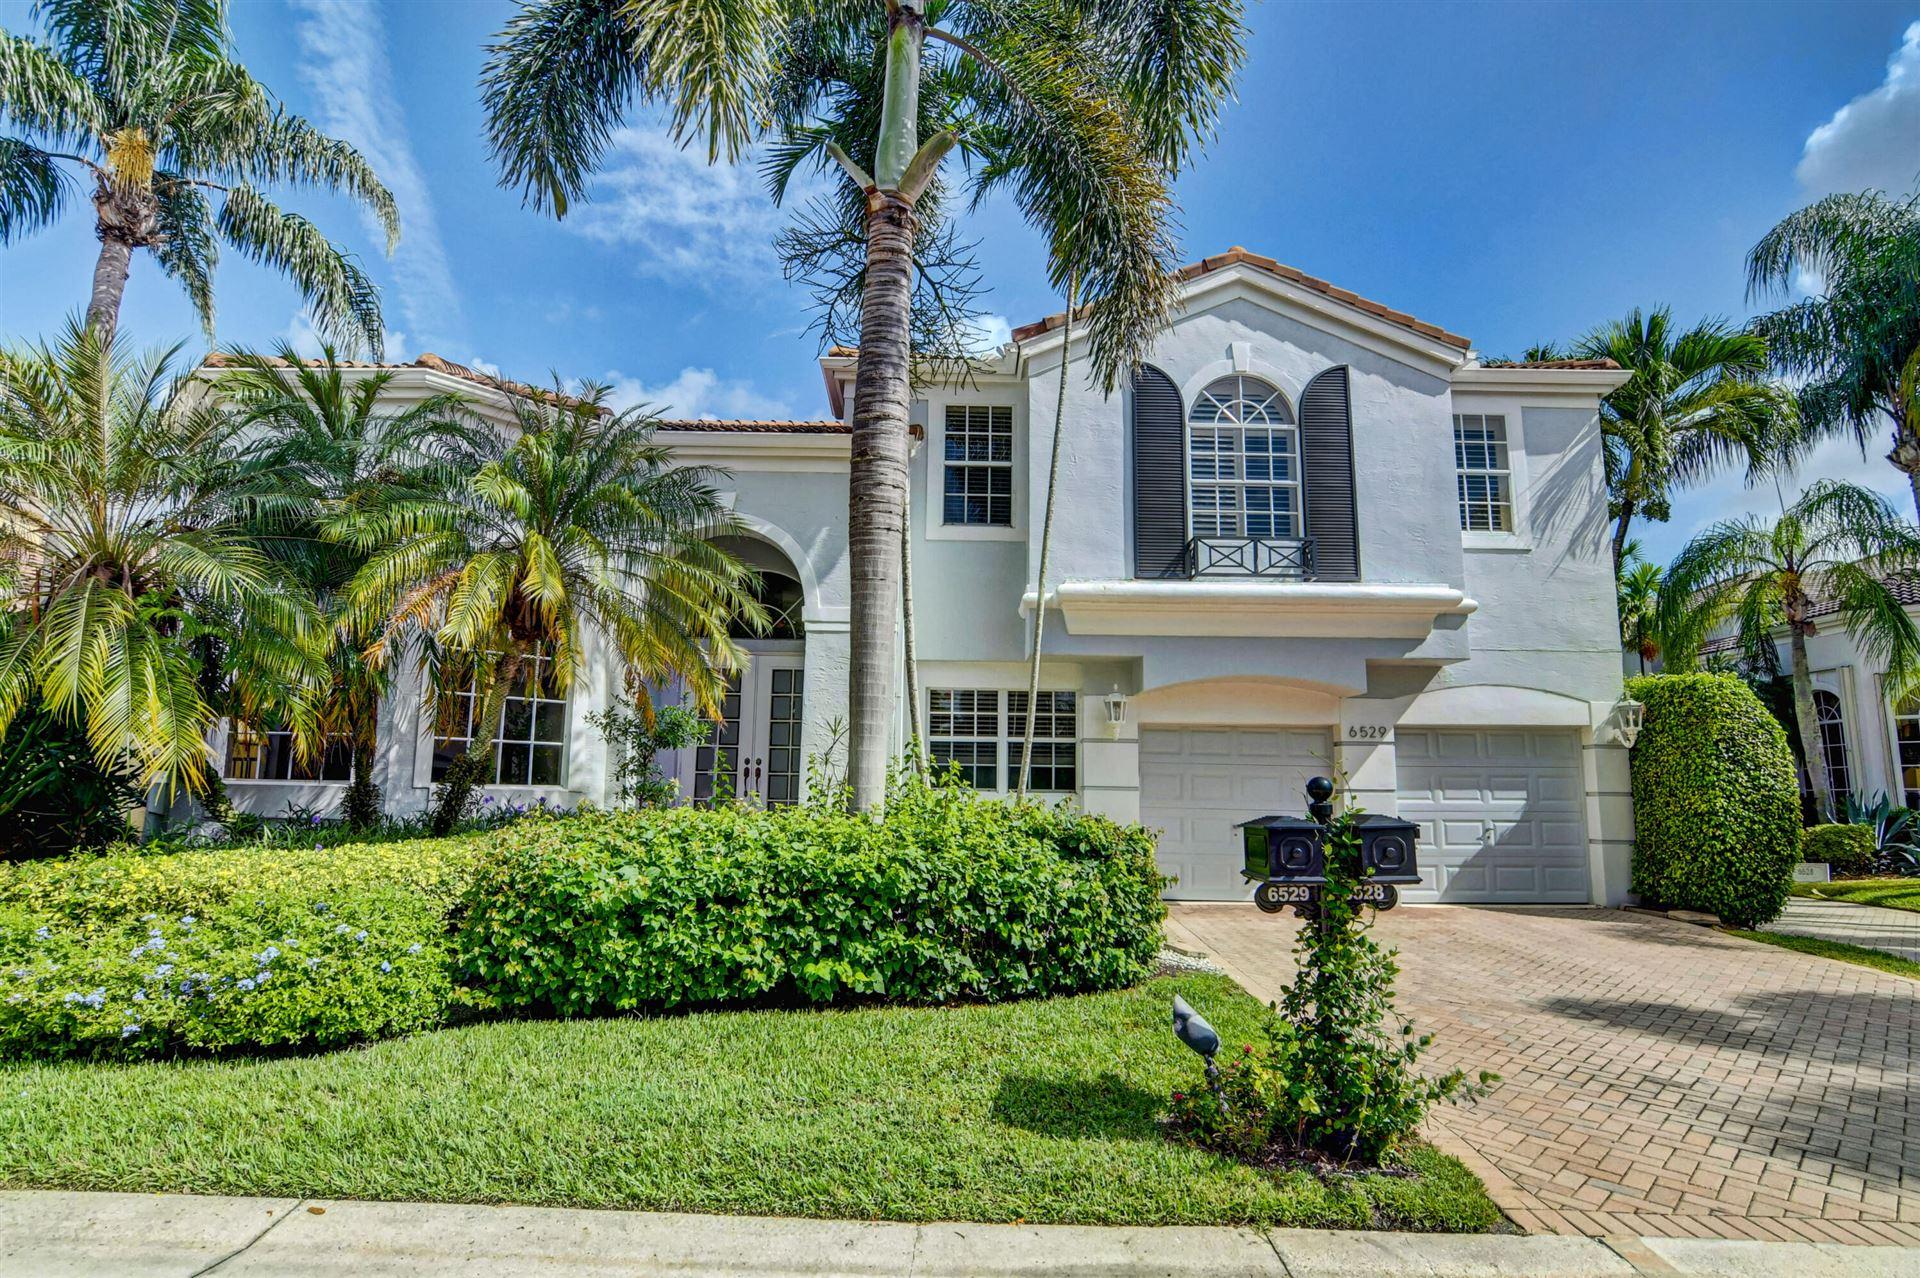 6529 NW 40th Court, Boca Raton, FL 33496 - MLS#: RX-10741850